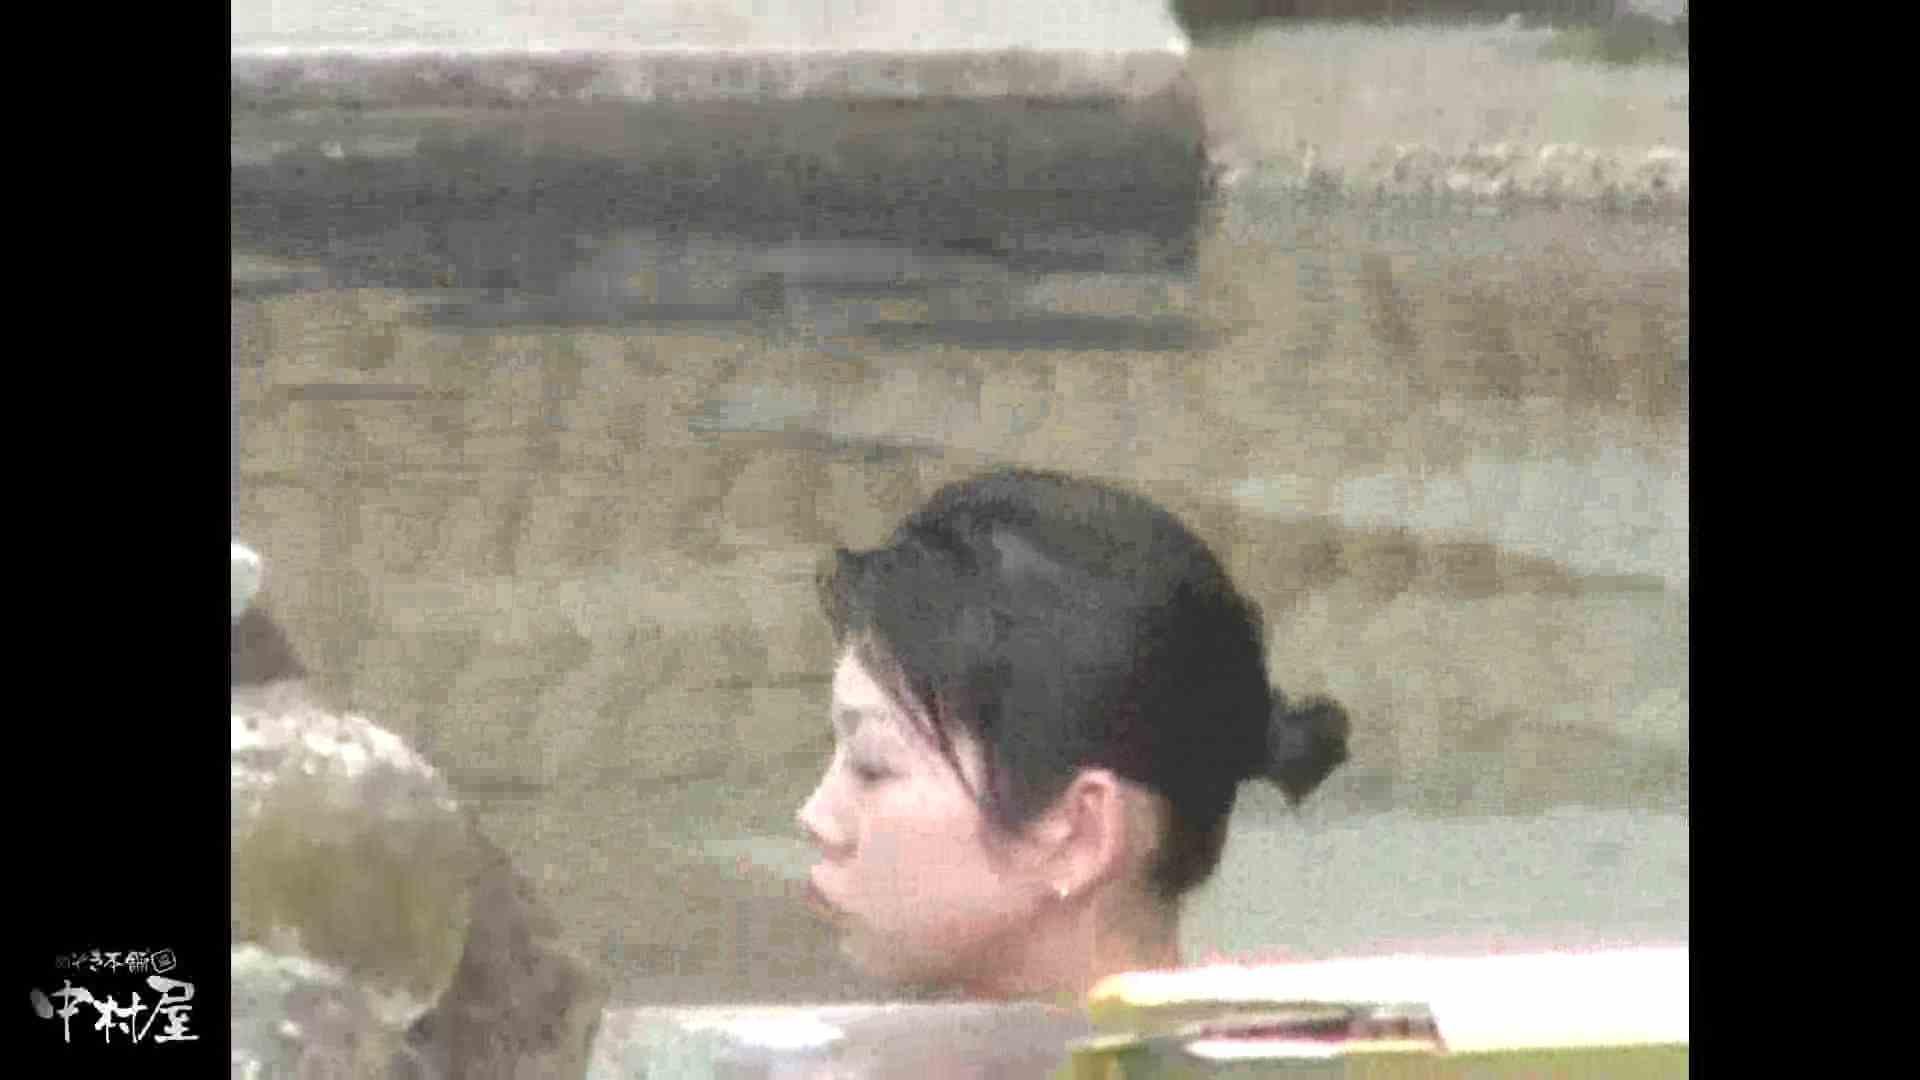 Aquaな露天風呂Vol.881潜入盗撮露天風呂十七判湯 其の三 潜入 のぞき動画画像 72画像 55